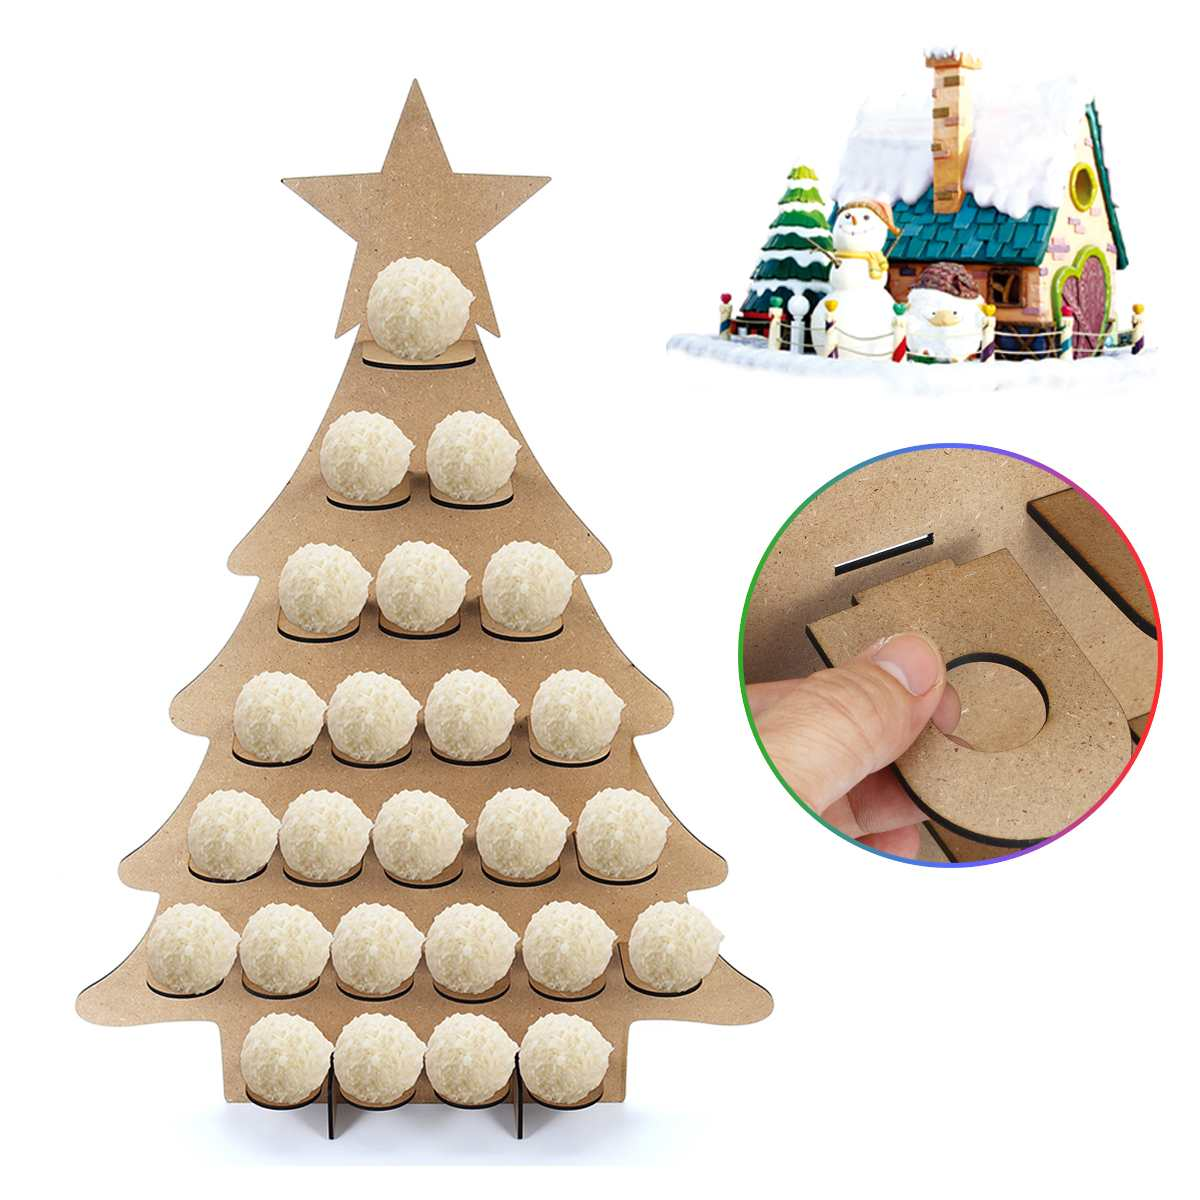 Home Christmas Tree Countdown Calendar Wooden Christmas Chocolate Display Stand Calendar For Home Decoration 68x47cm